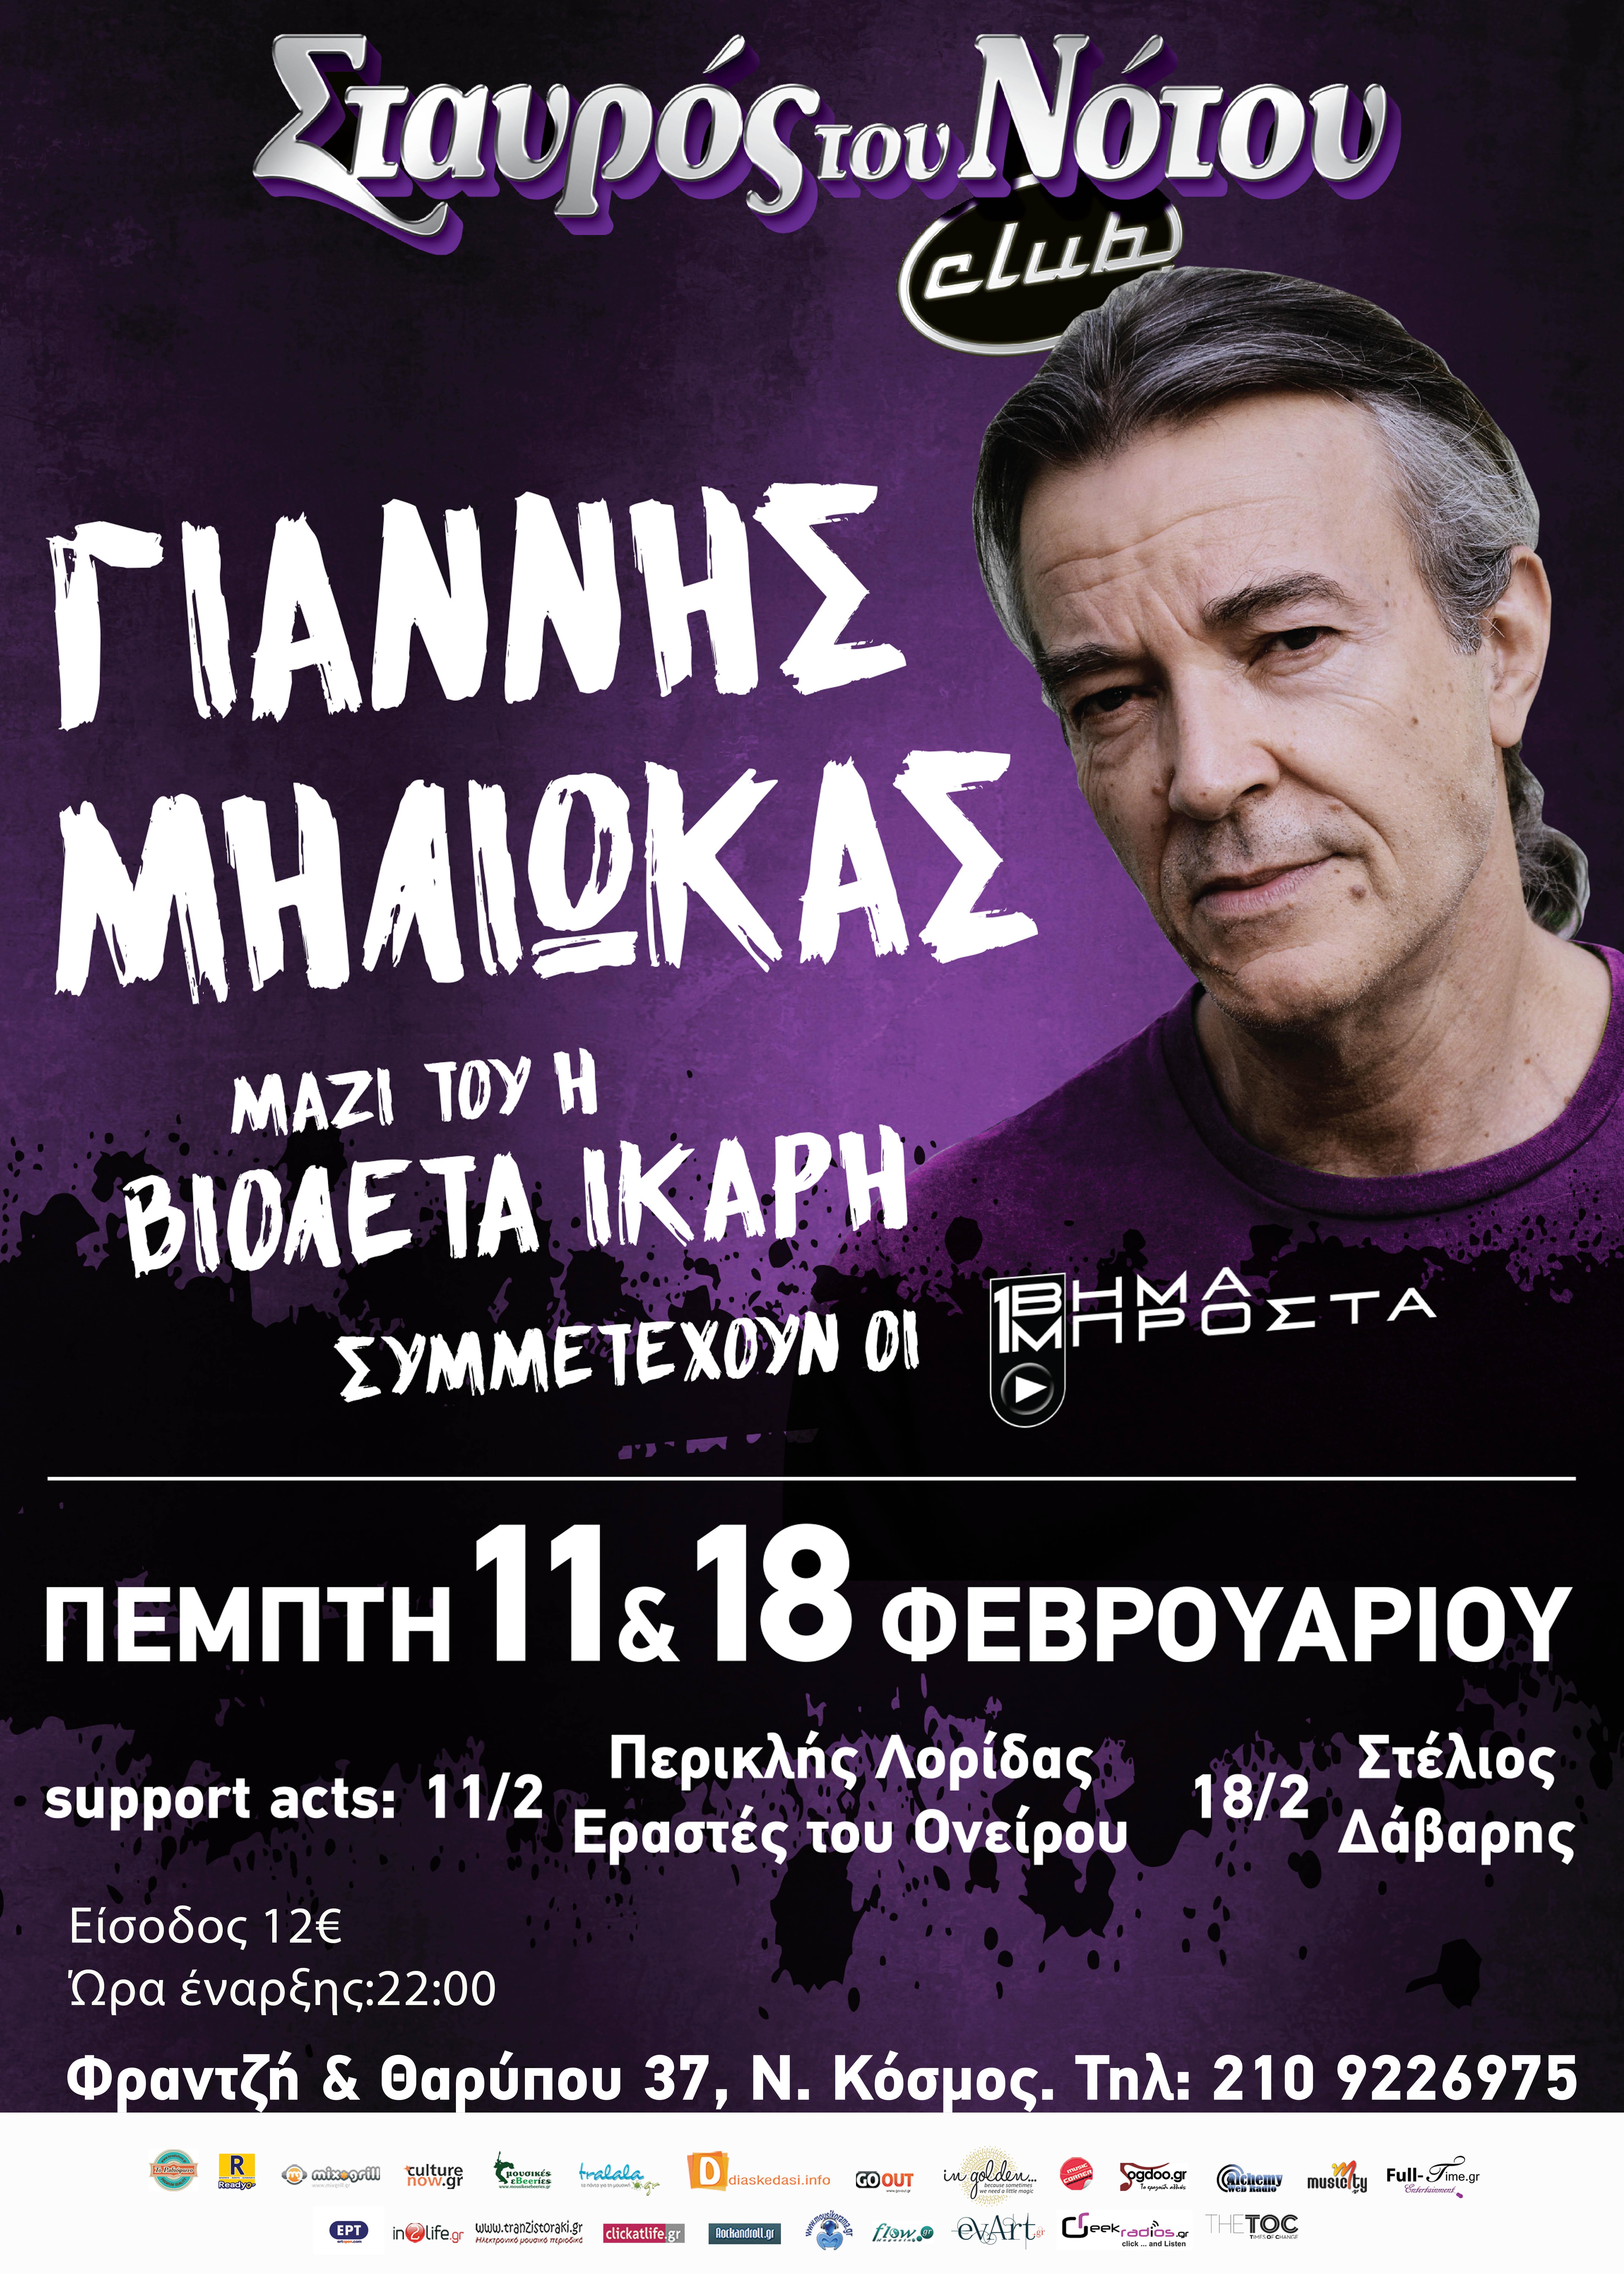 miliokas-ikari-stn-feb-2016-blankj-poster-final-print-e-o